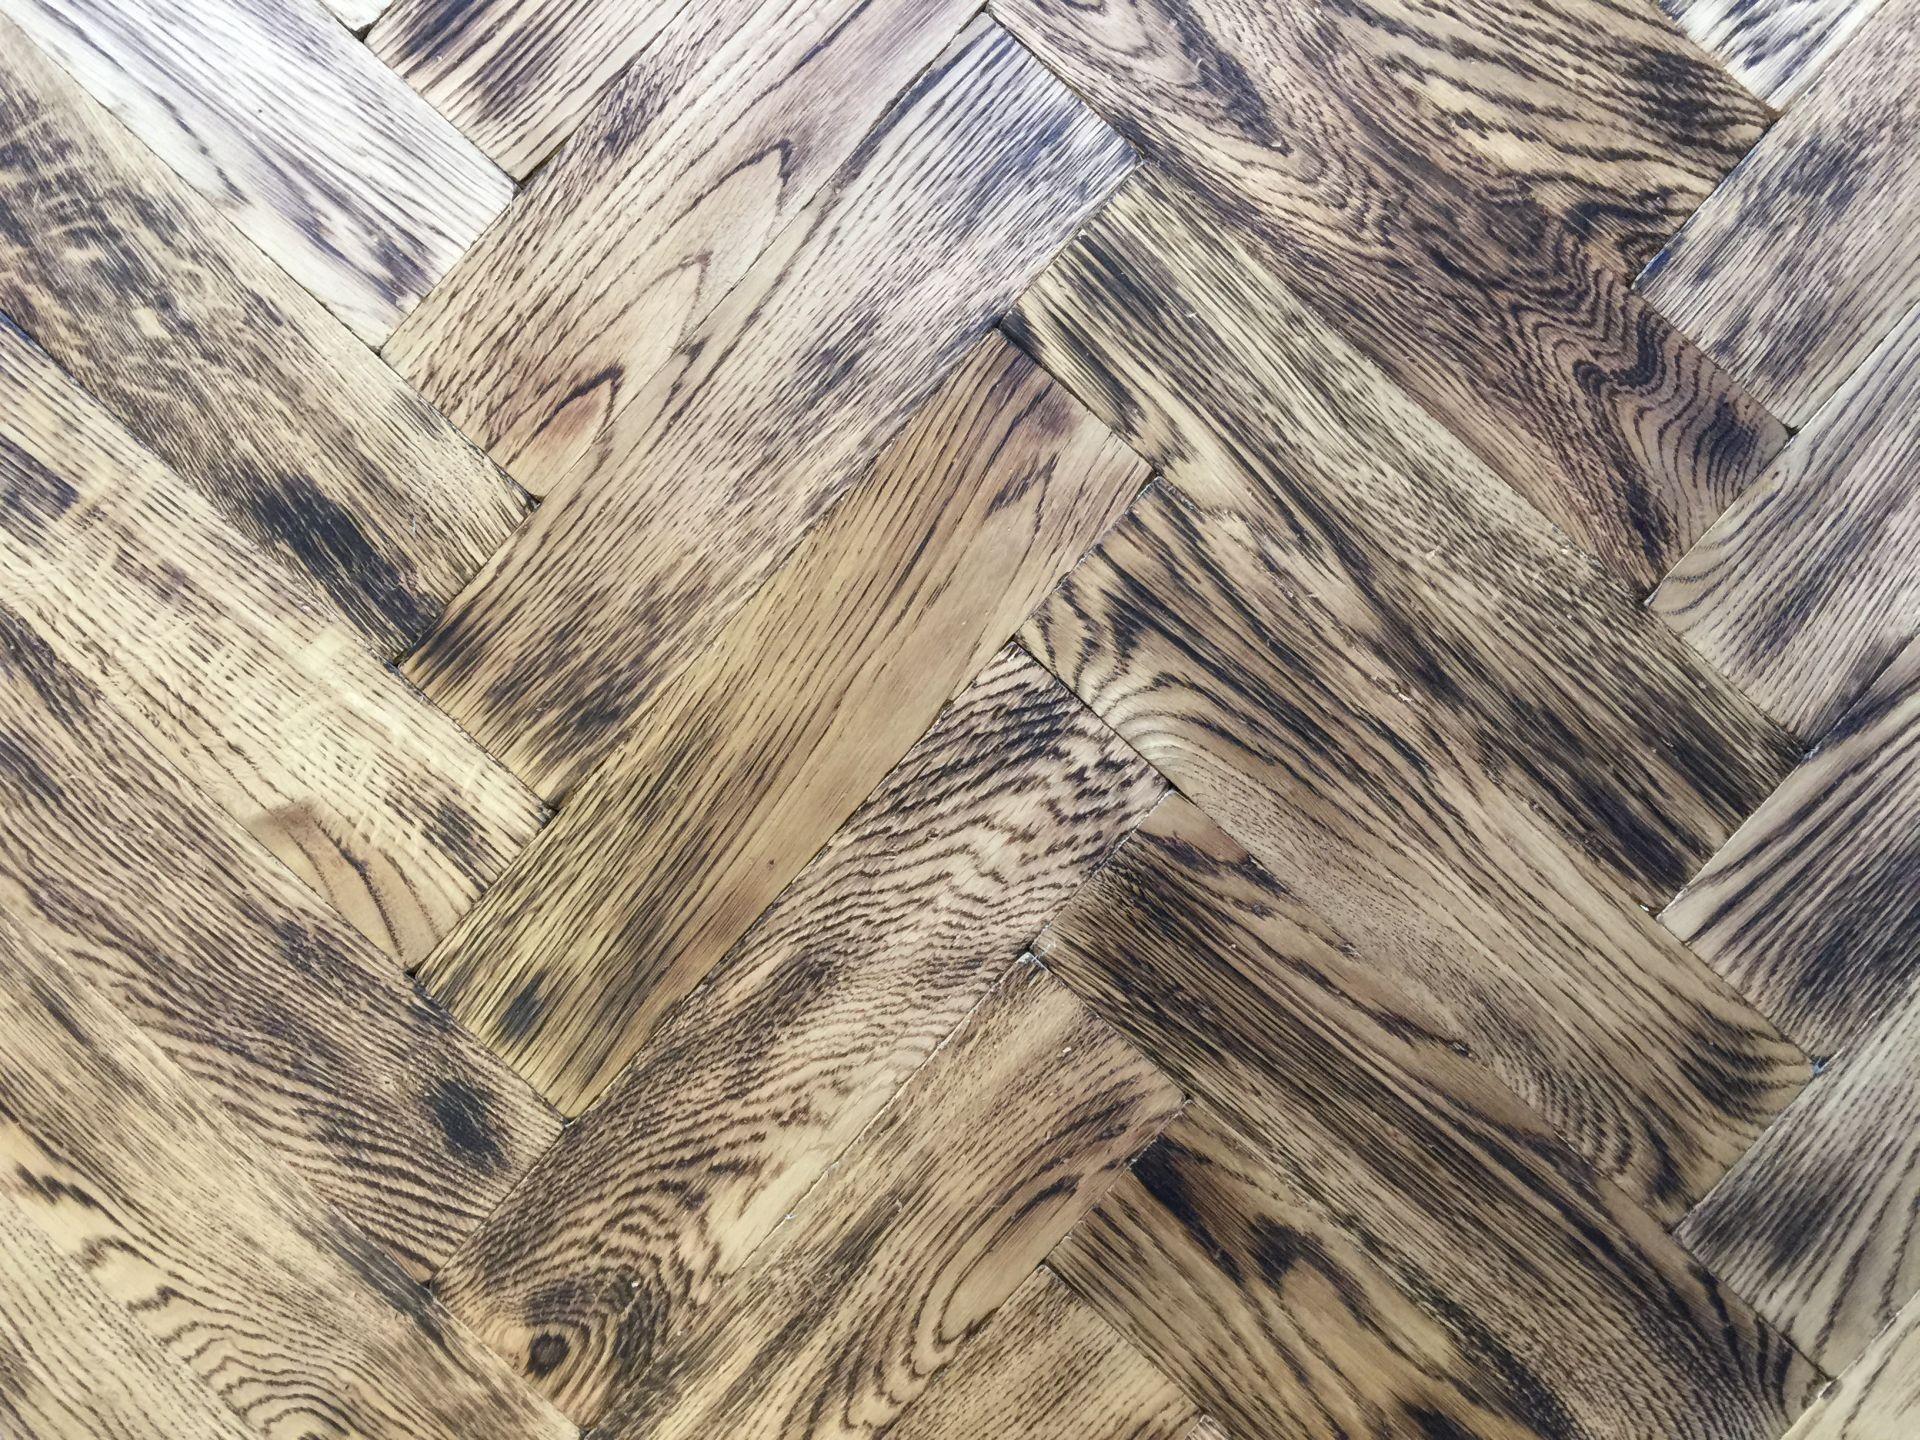 Tumbled rustic burnt oak parquet flooring blocks natro finish size tumbled rustic burnt oak parquet flooring blocks natro finish size 16x70x280mm oak flooring suppliers solid ppazfo